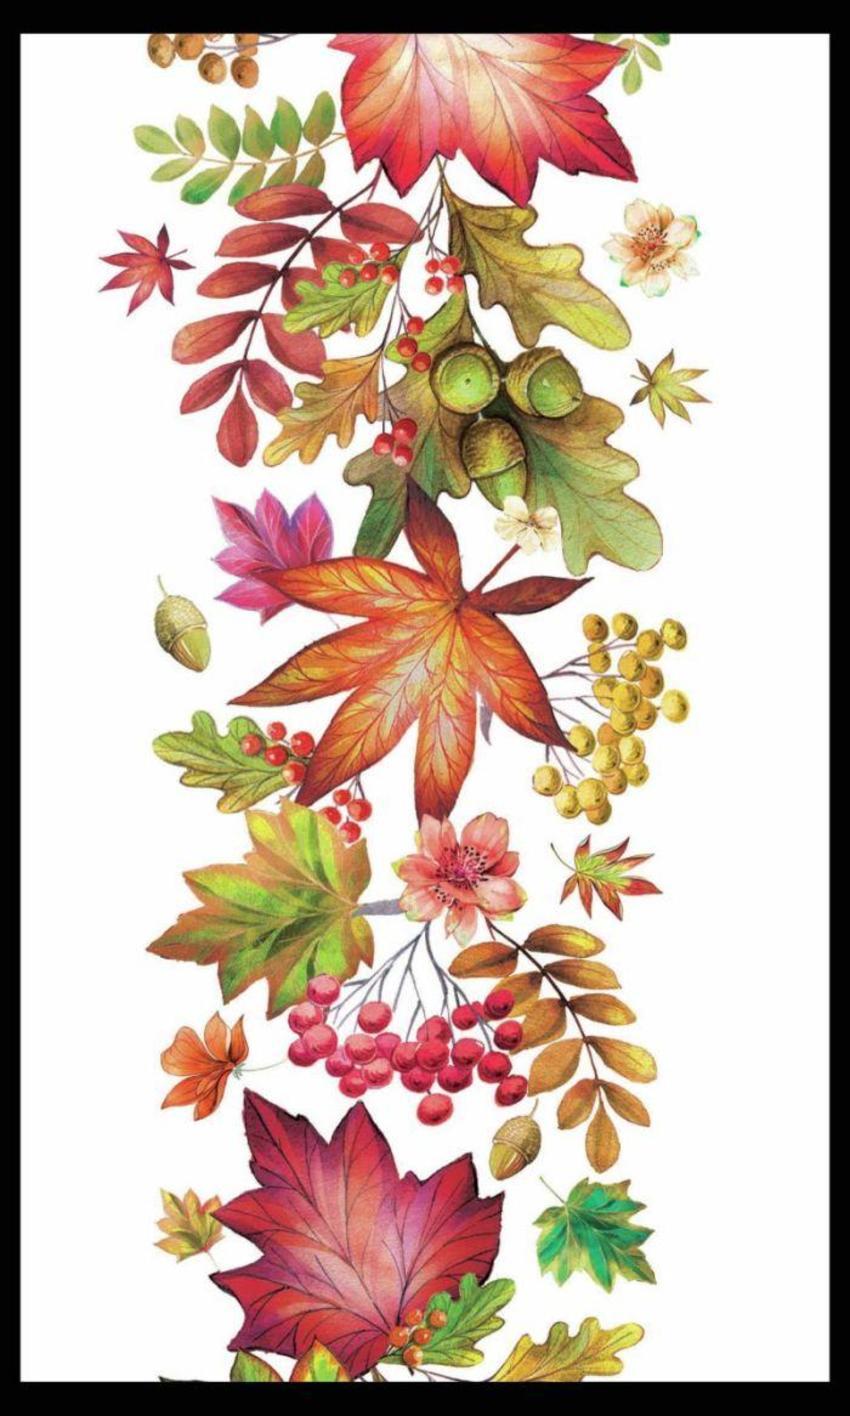 Autumn-leaves-cascade-amend